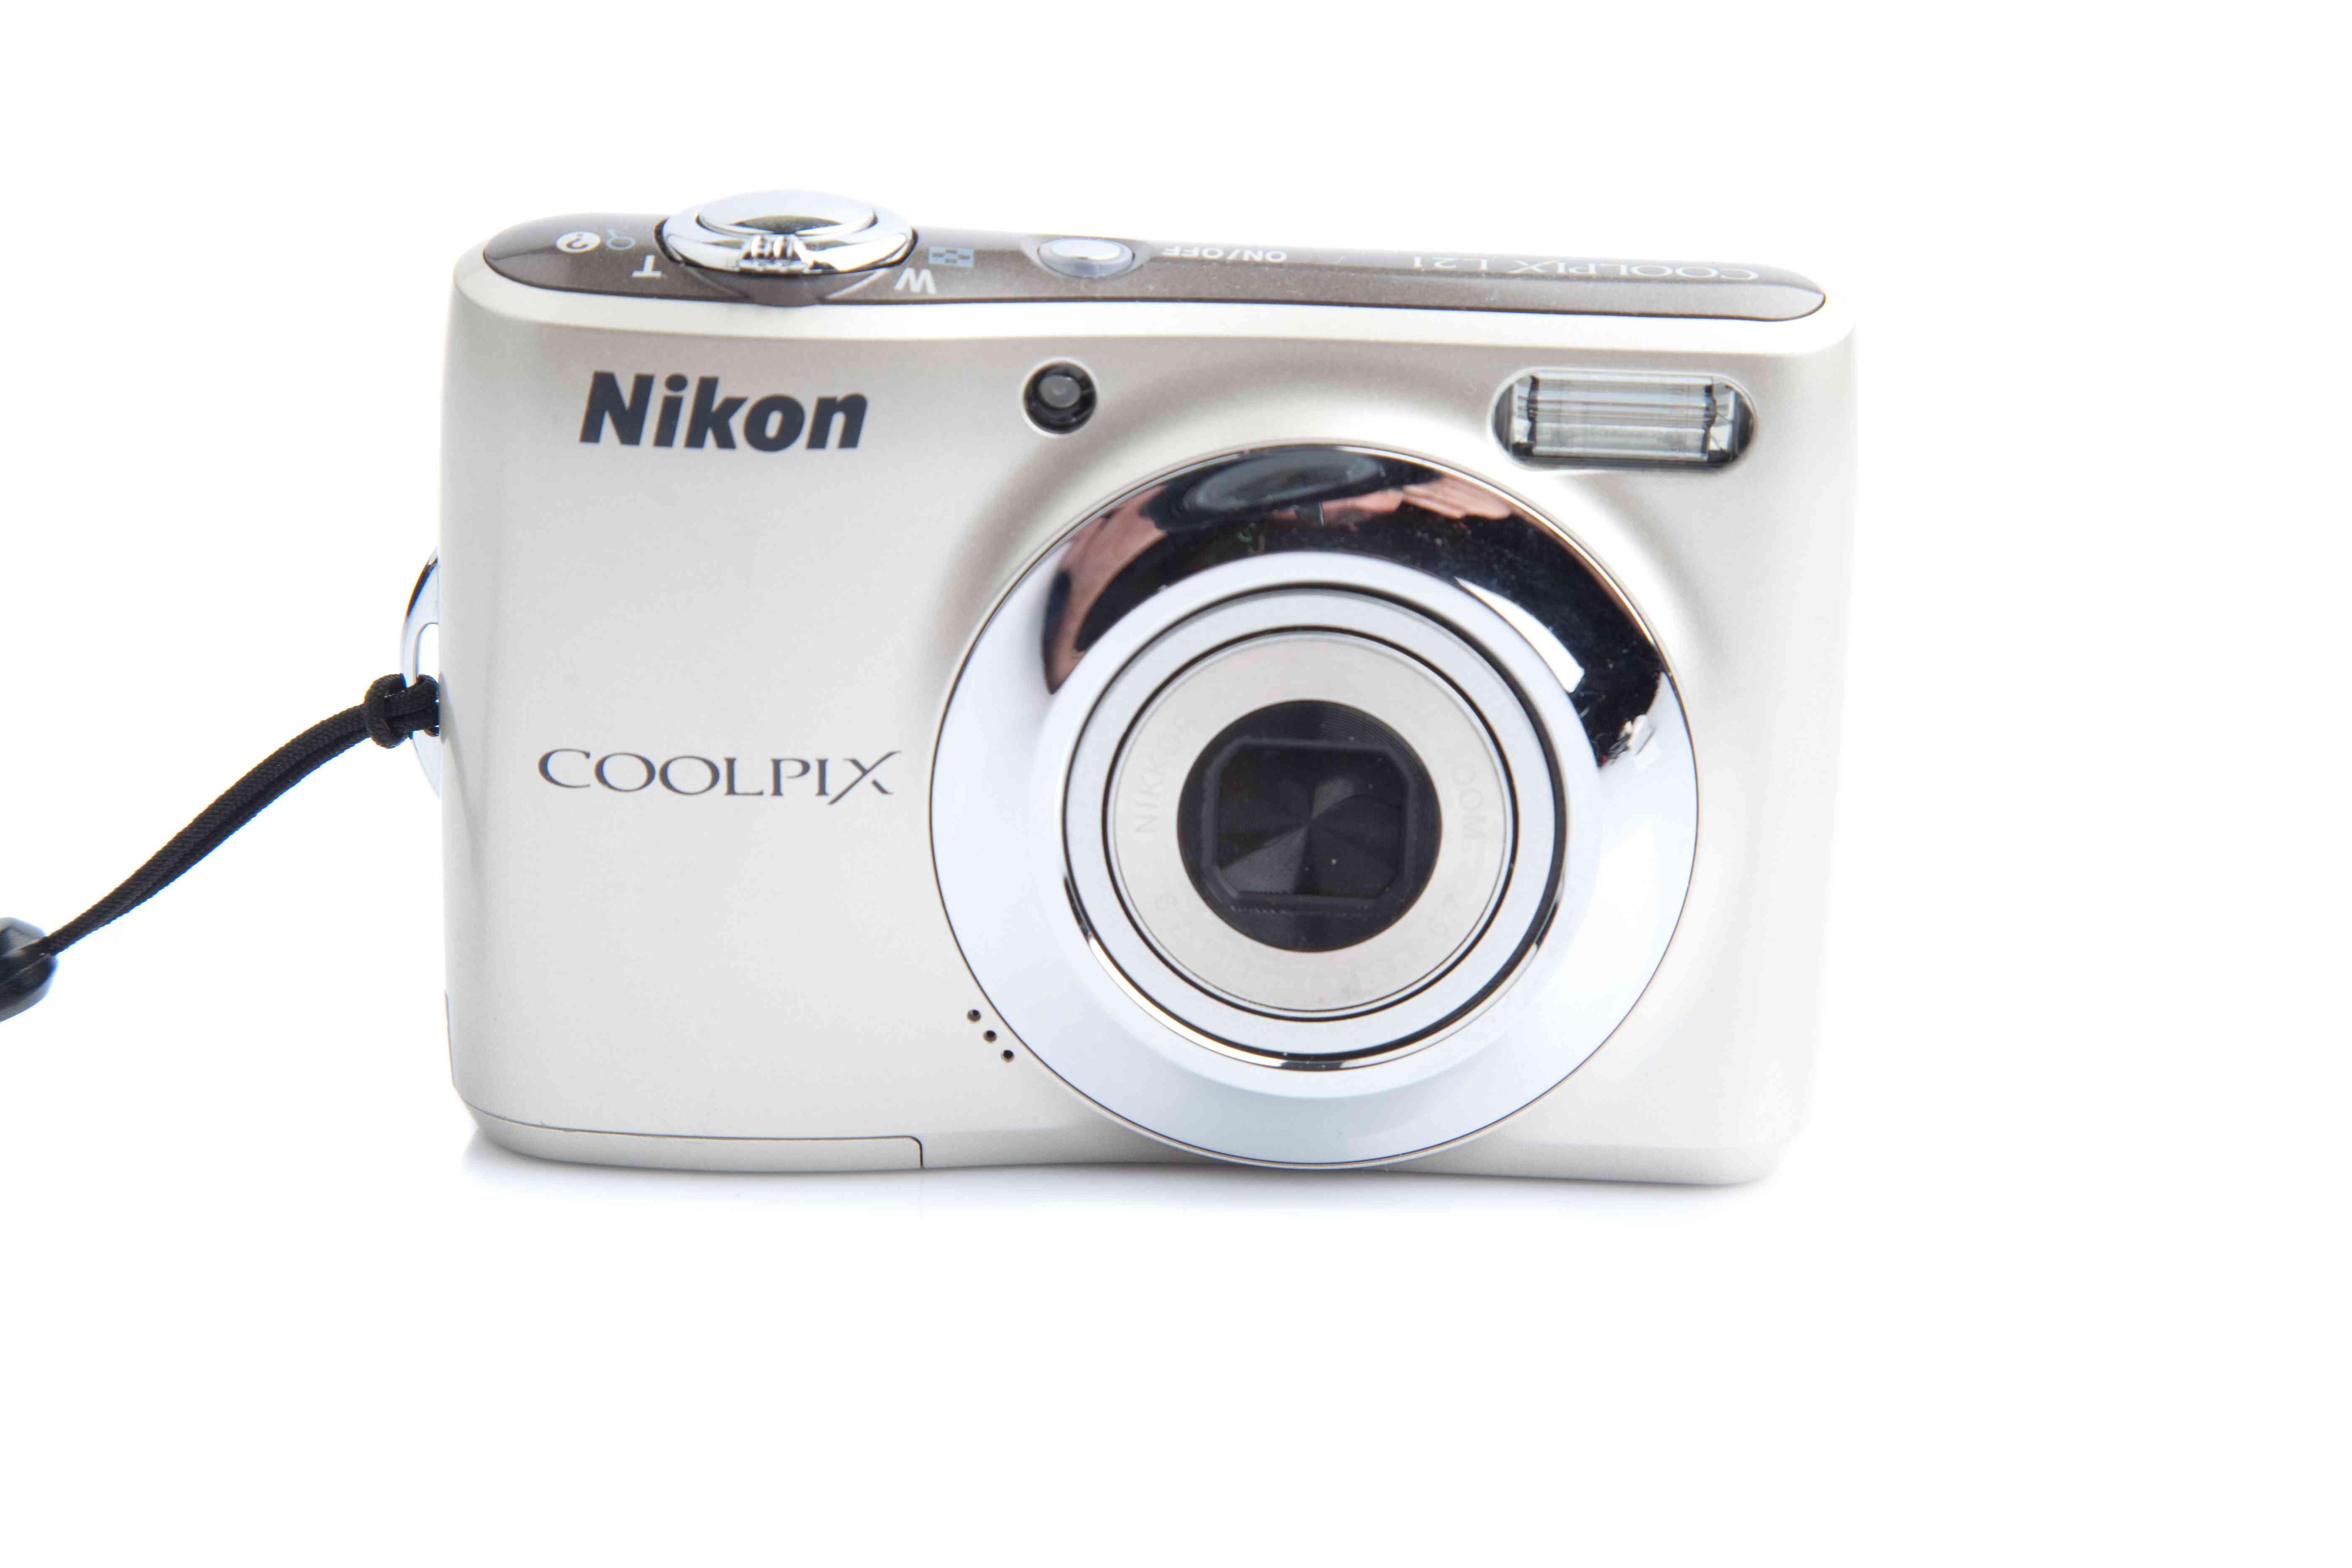 White Nikon Point and Shoot Digital Camera